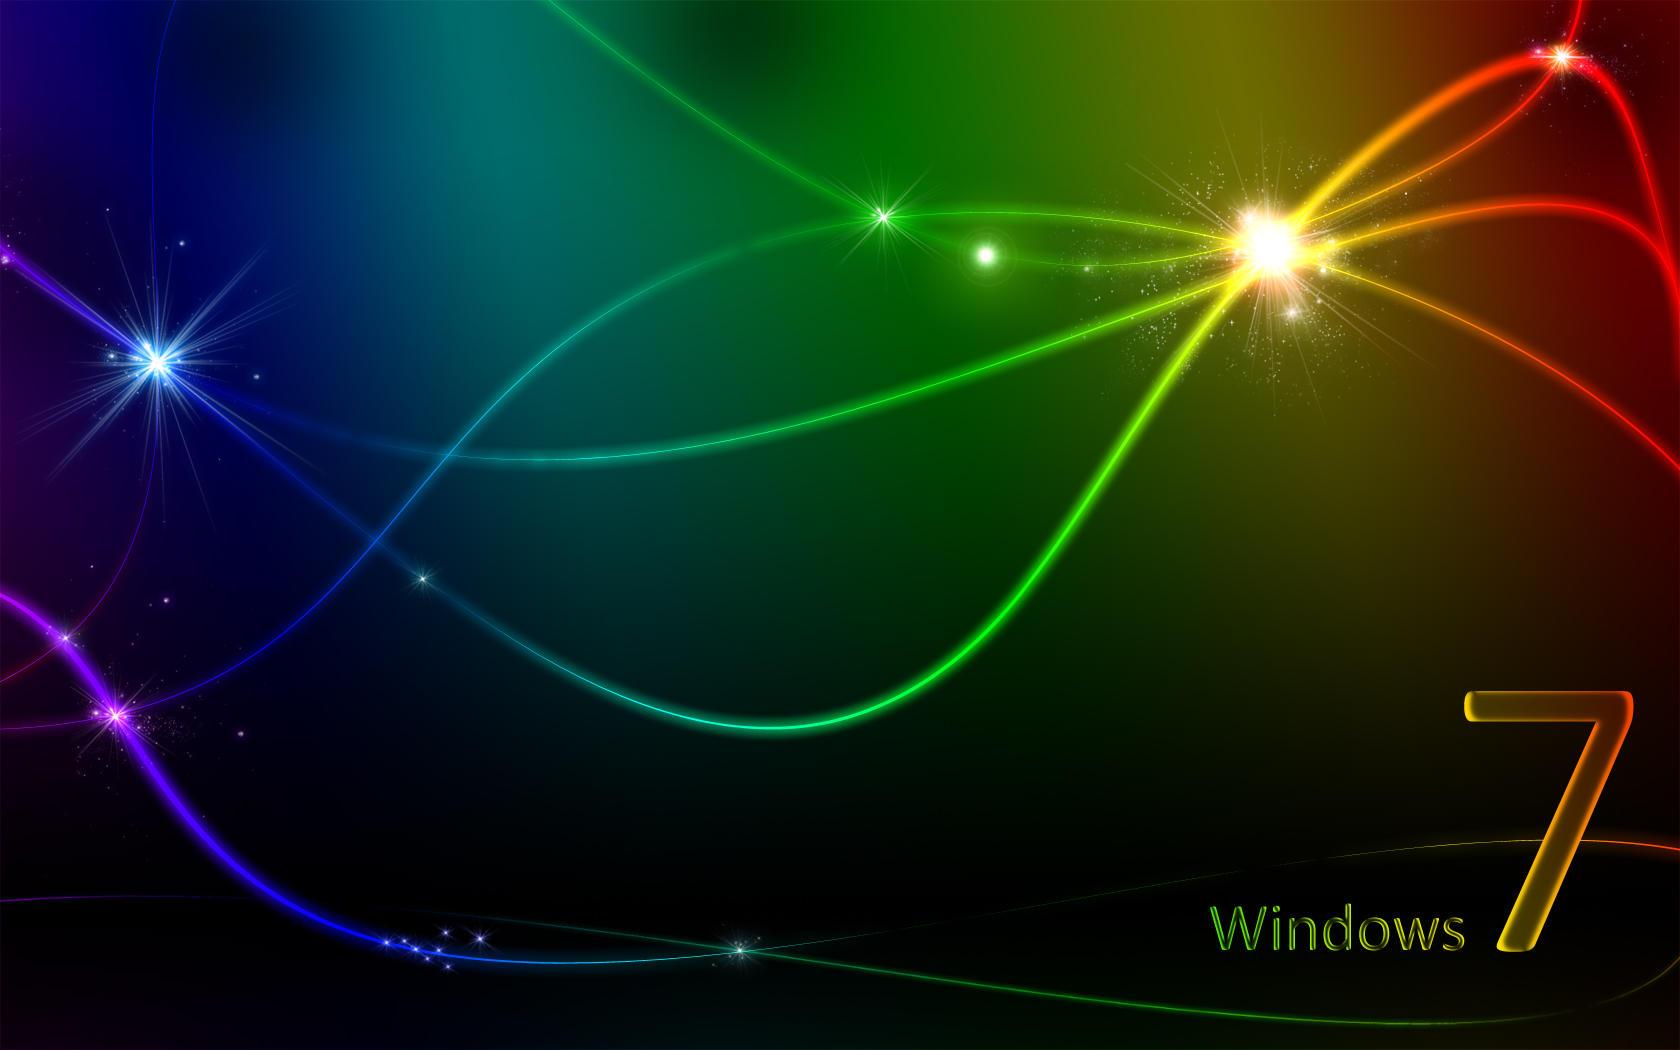 Elemental Sparks - Windows 7 by morningstar3878